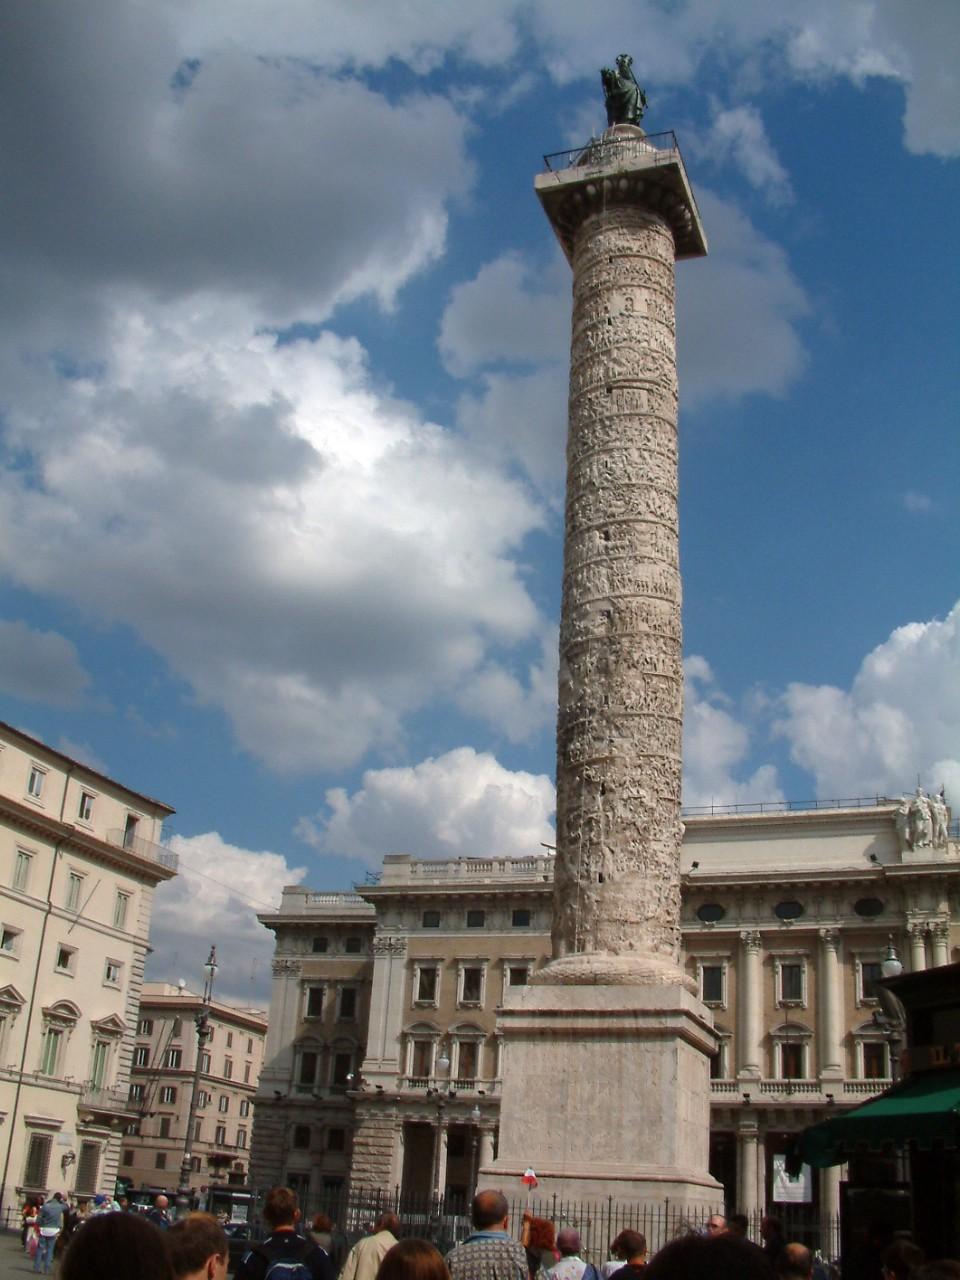 http://upload.wikimedia.org/wikipedia/commons/a/ab/Kolumna_Aureliusza.jpg